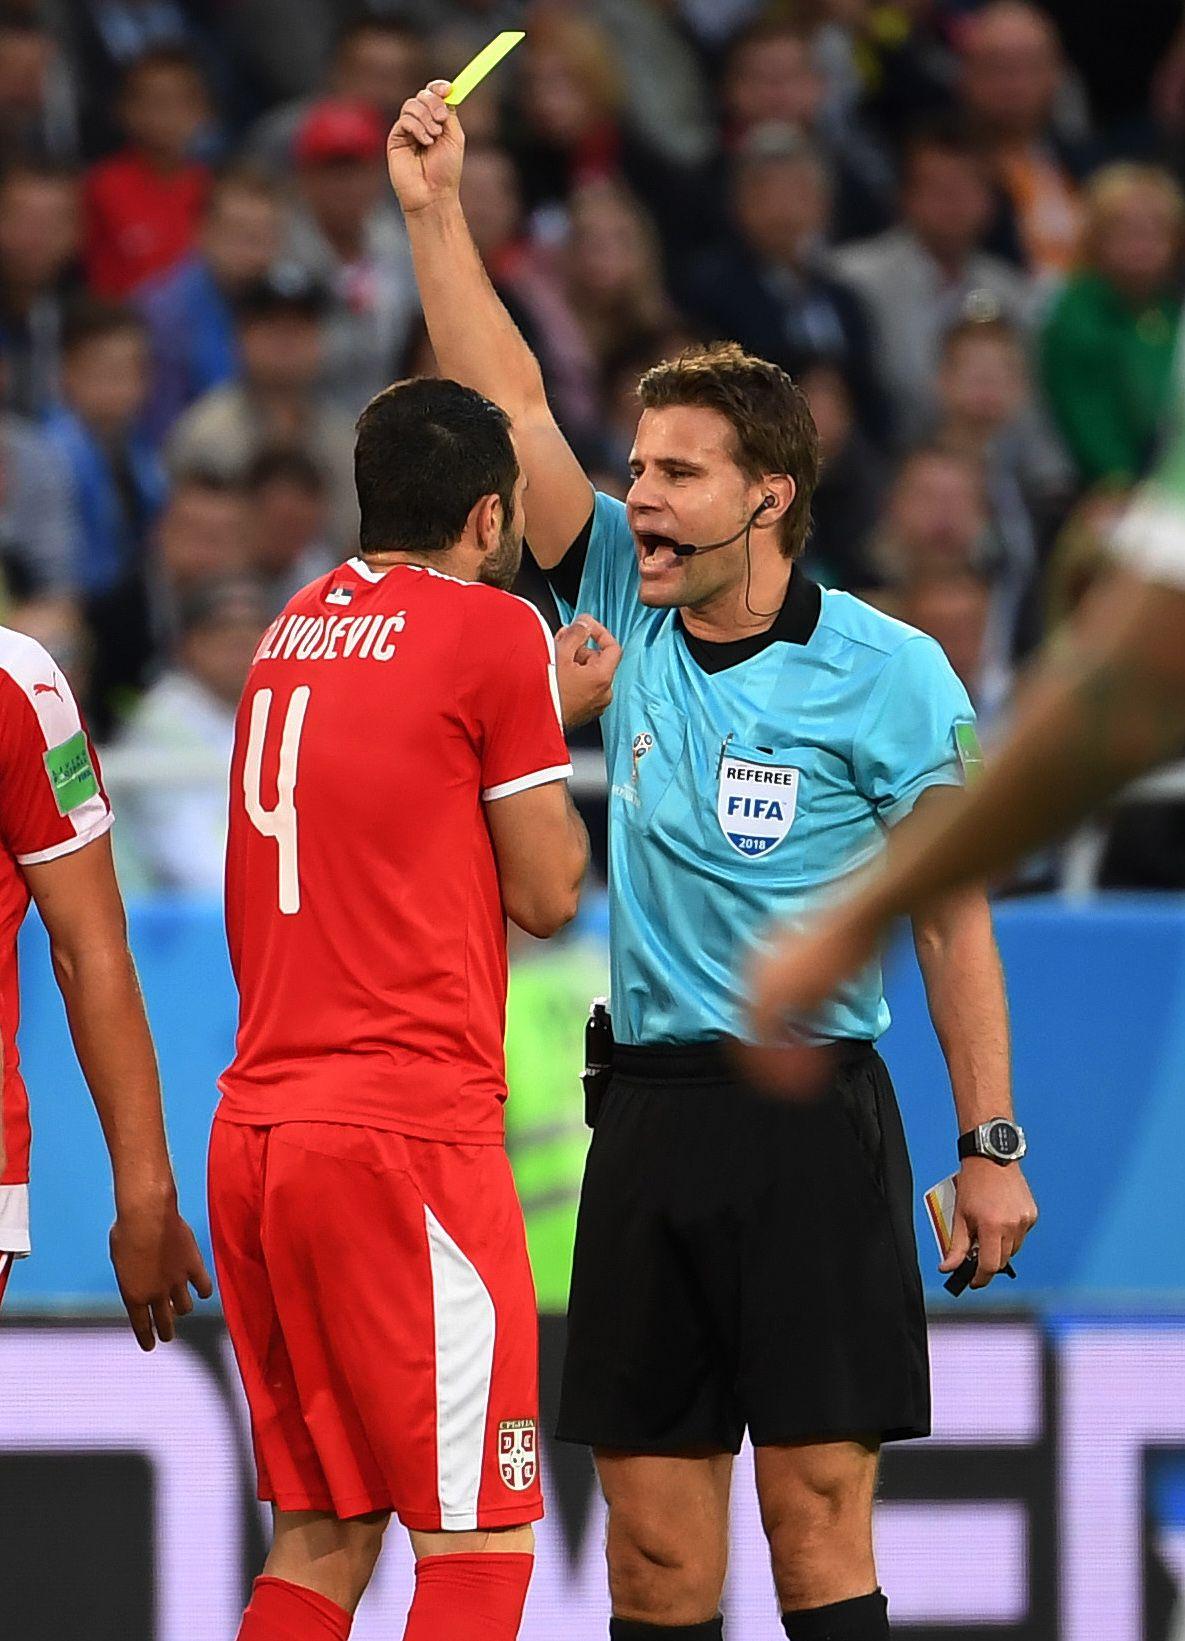 Serbien Schweiz Schiedsrichter